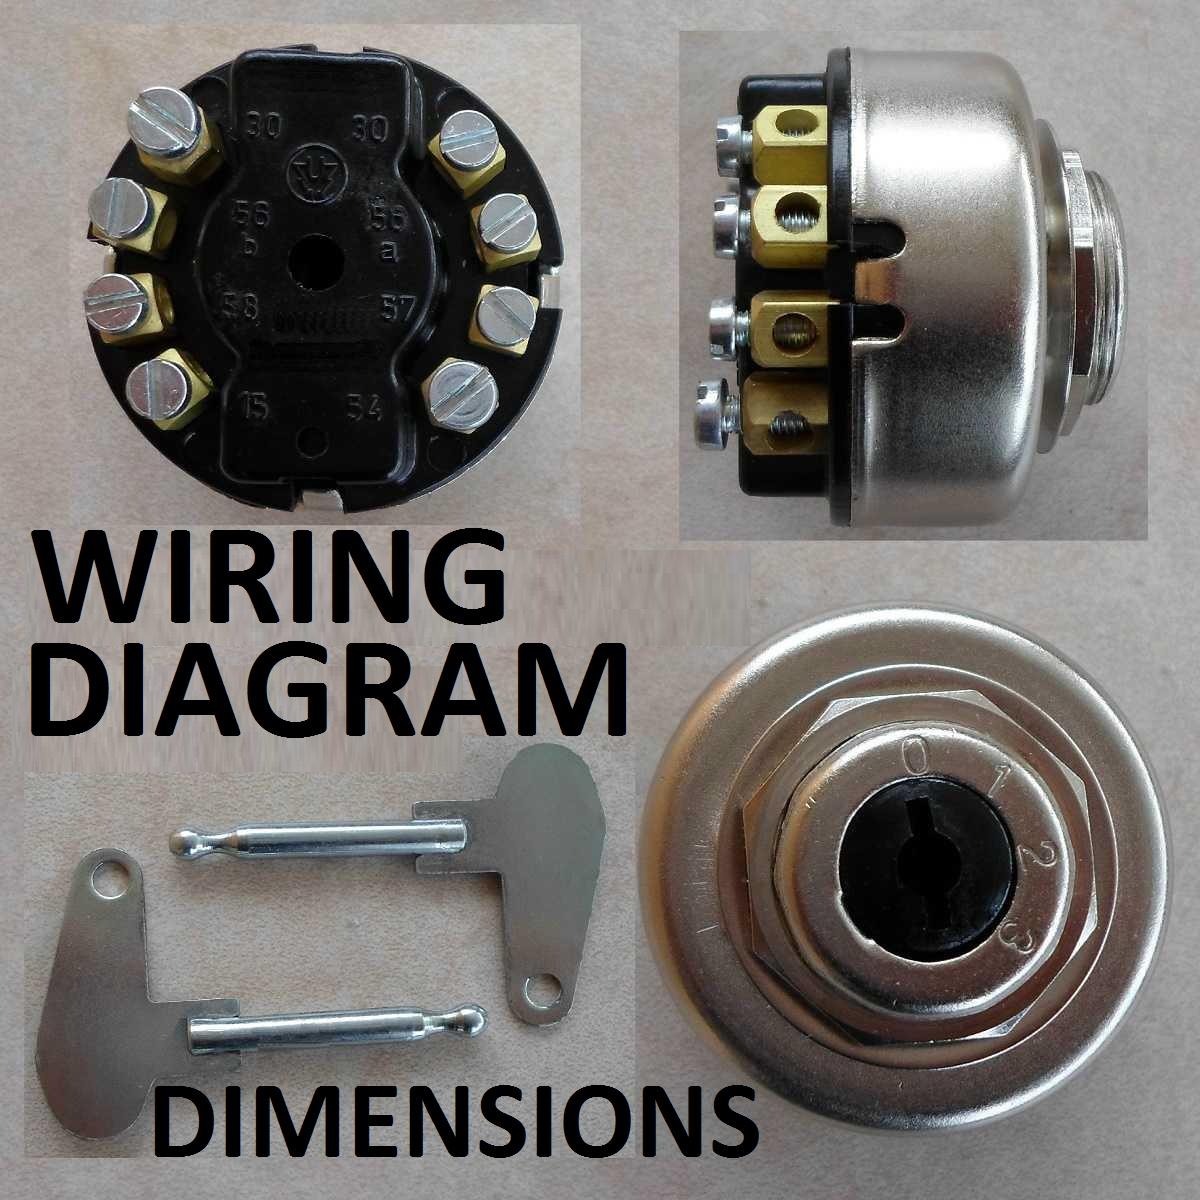 David Brown Tractor 1210 Wiring Diagram Electrical Diagrams Ford Alternator Schematics 885g